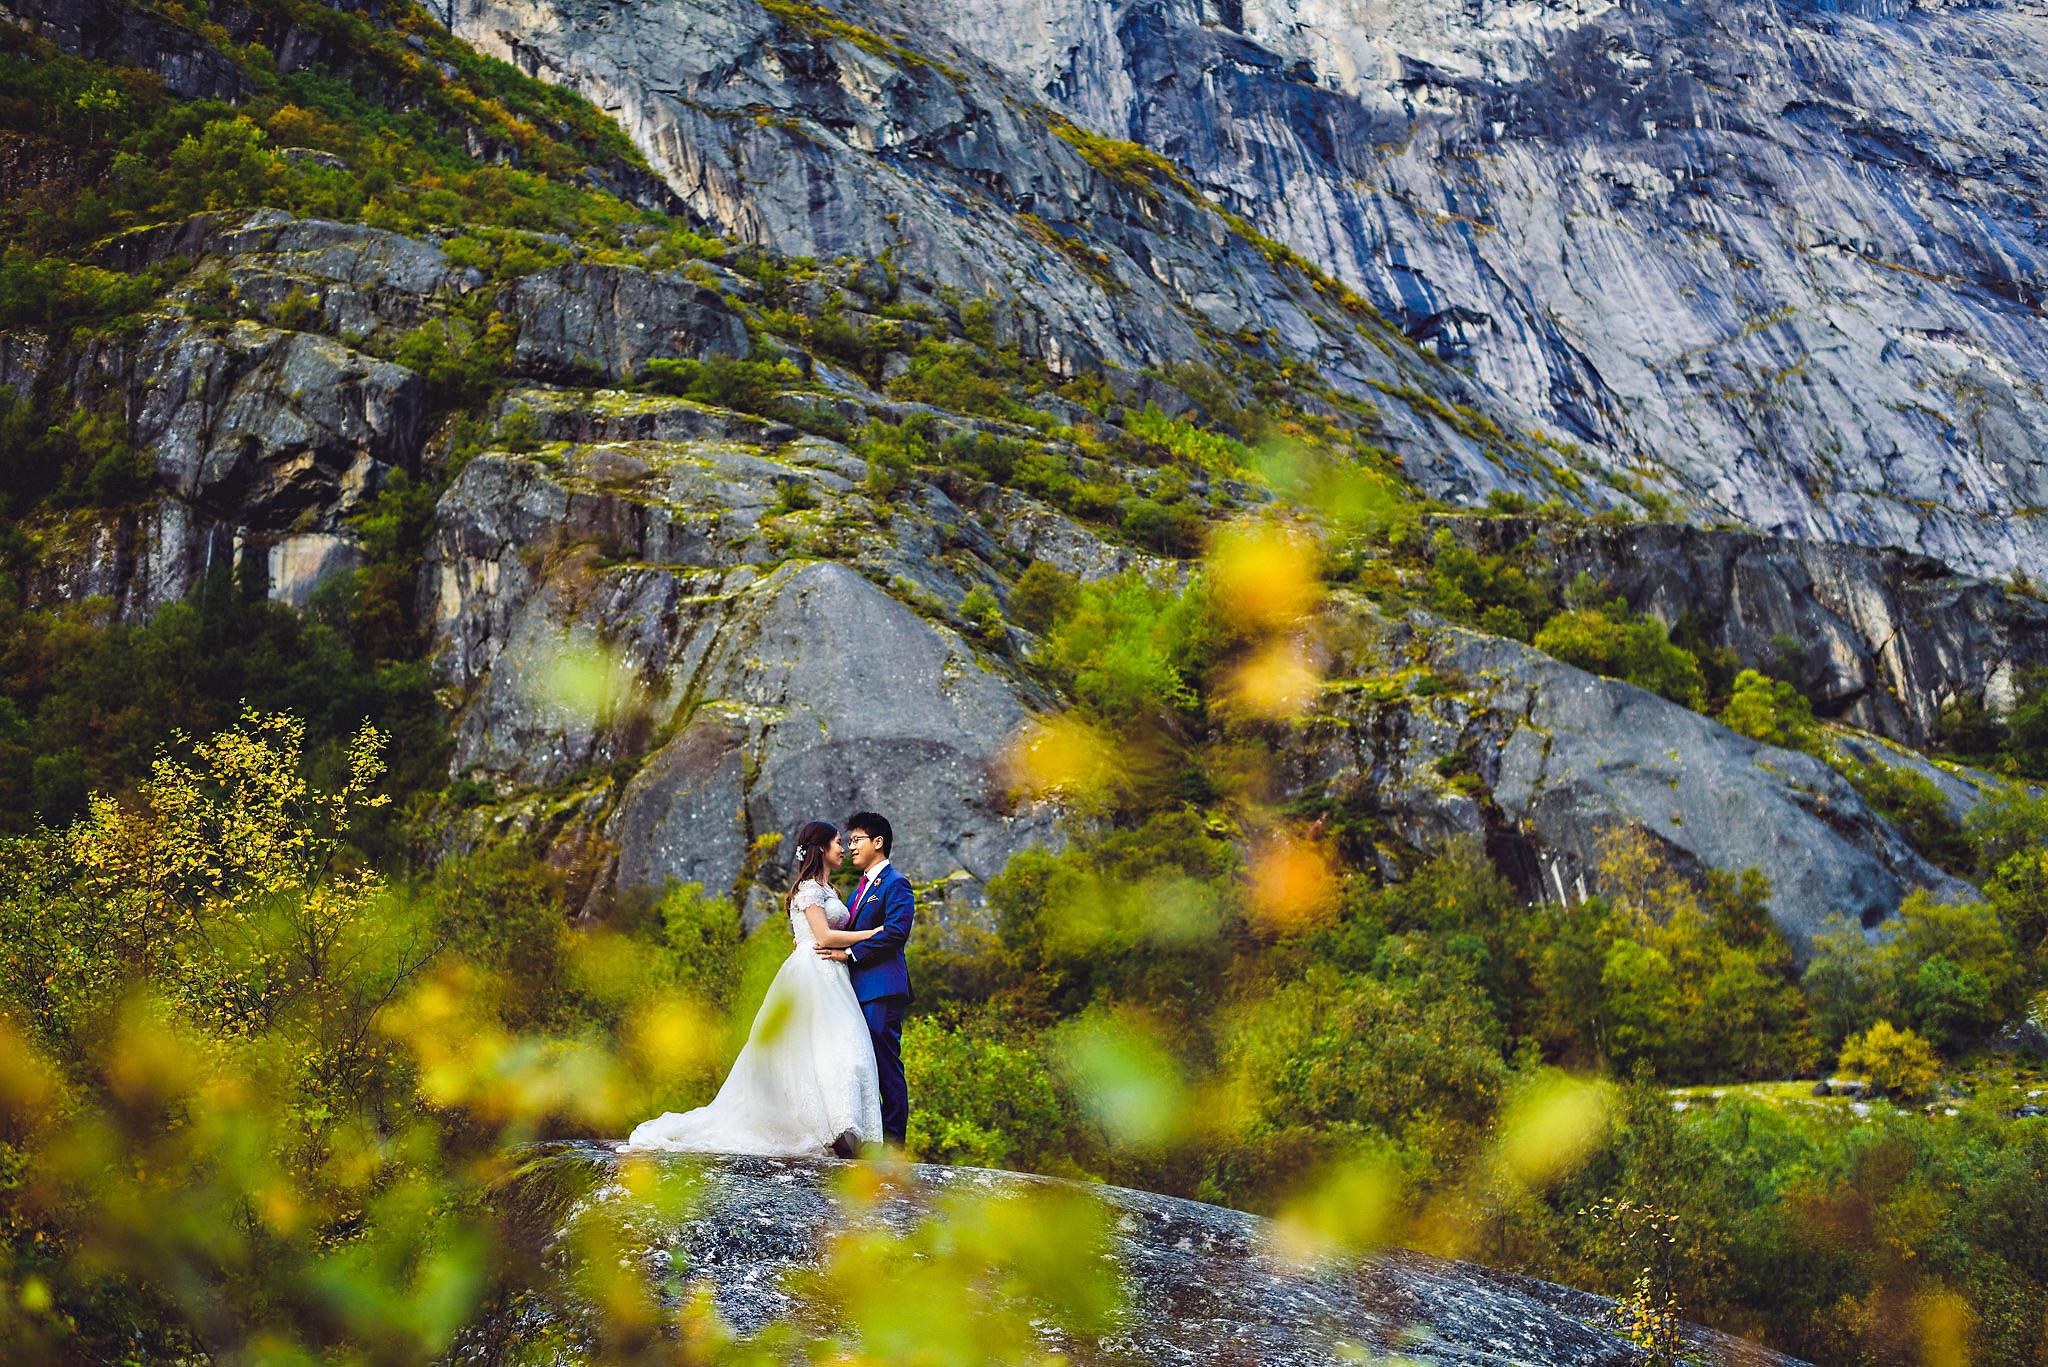 Bryllup på Yrineset i Oldedalen bryllupsfotograf sogn og fjordane-78.jpg